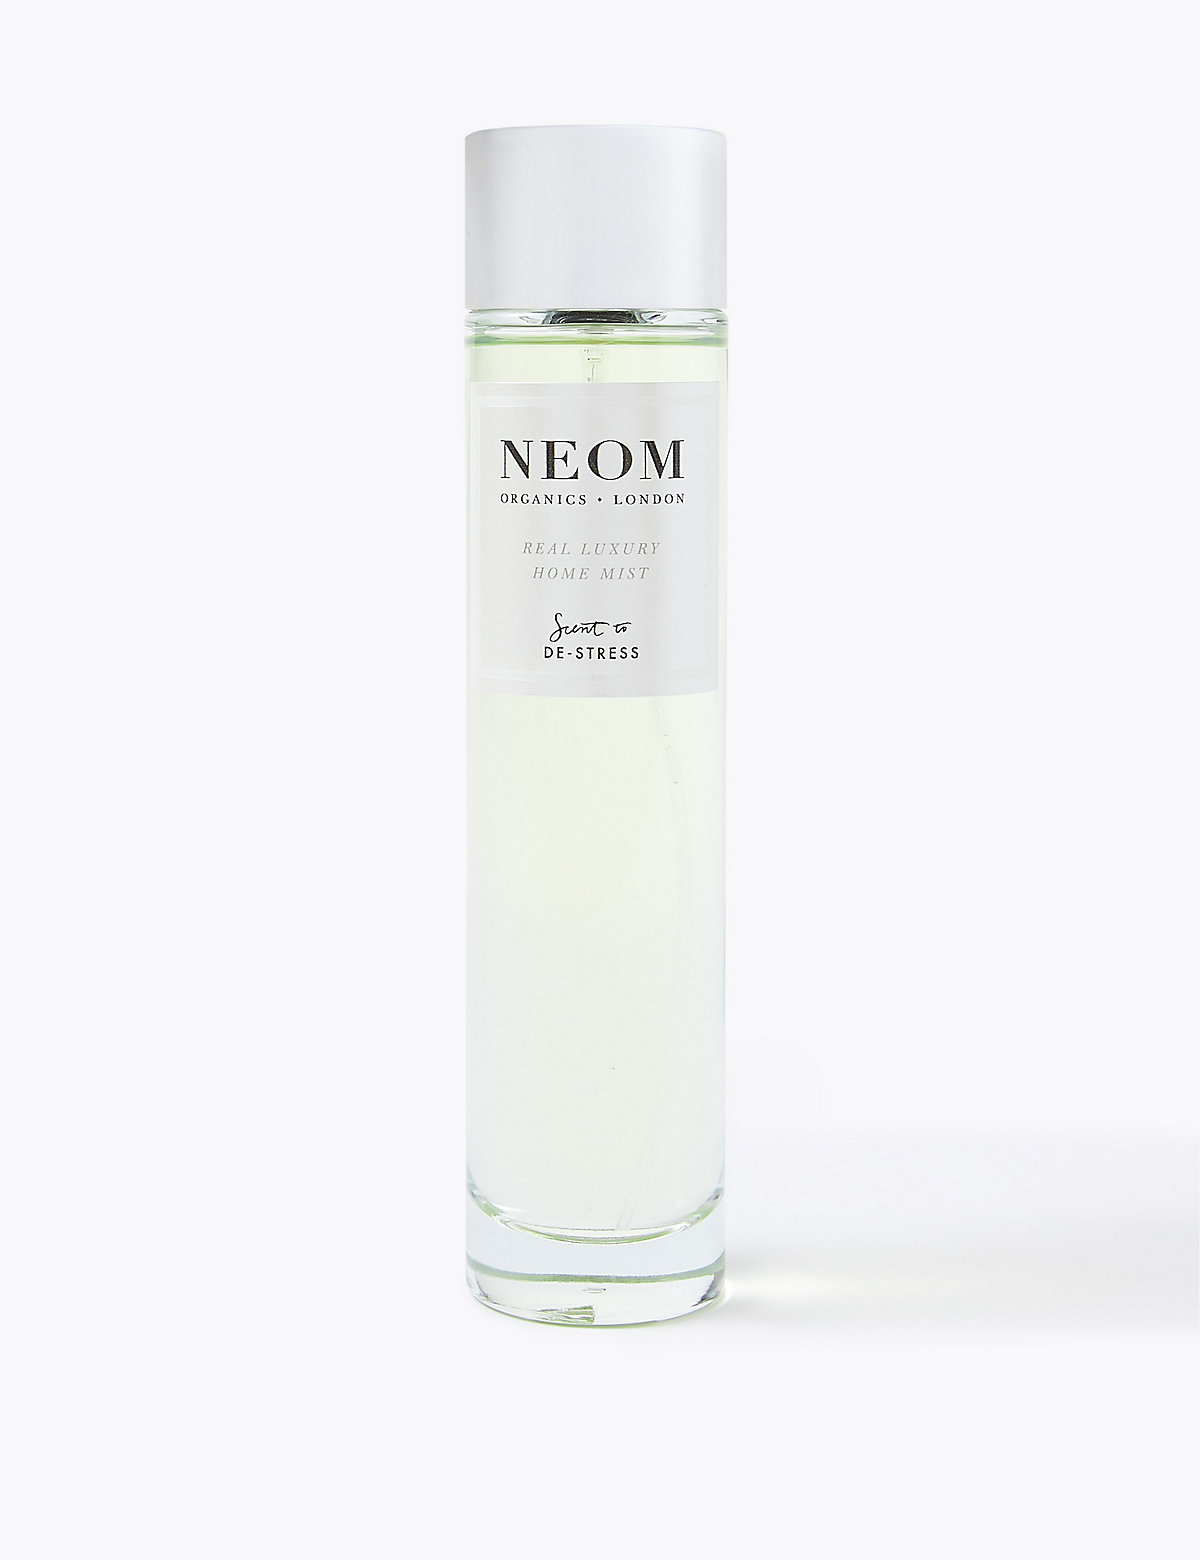 Neom De-Stress Home Mist 100ml